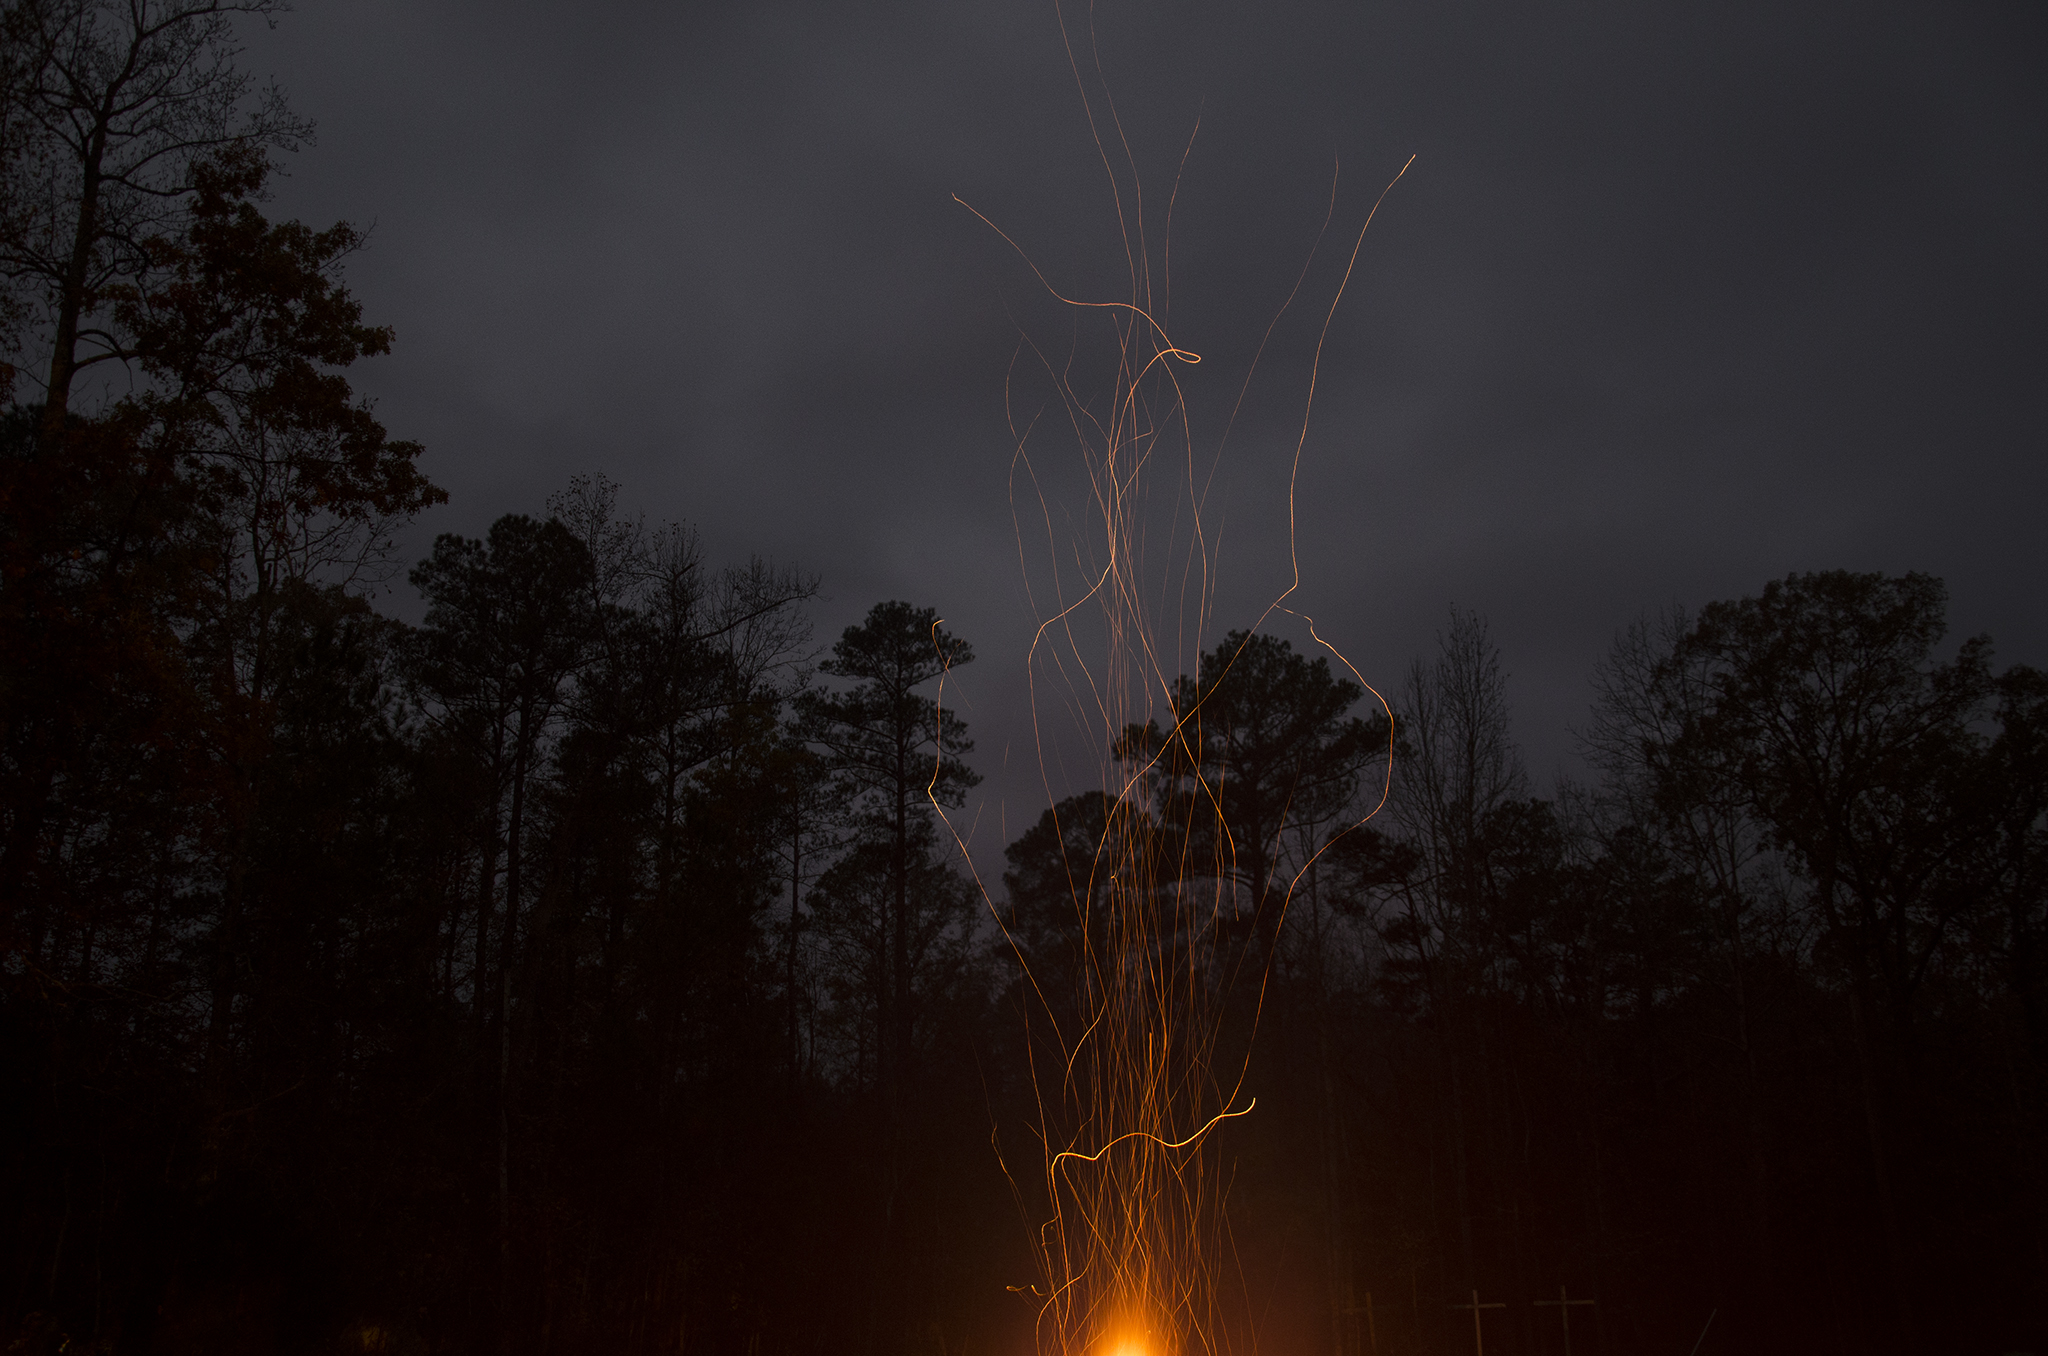 Camp Rudolph Fire in Yale, Virginia